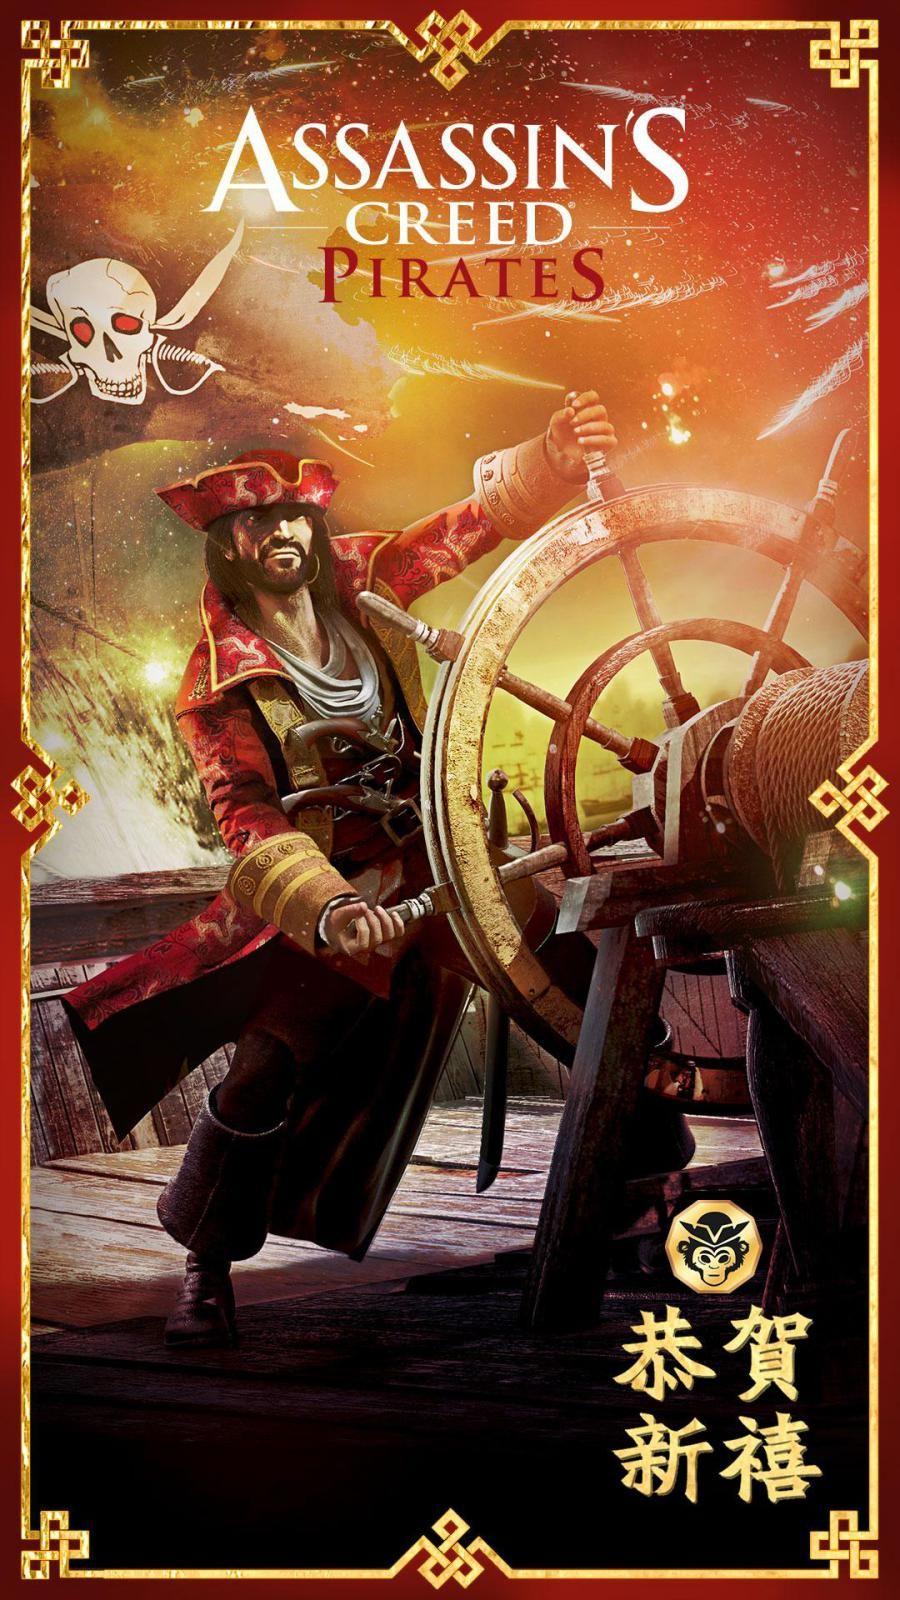 Assassin S Creed Pirates Hd V2 9 1 Mod Apk Data Unlimited Money